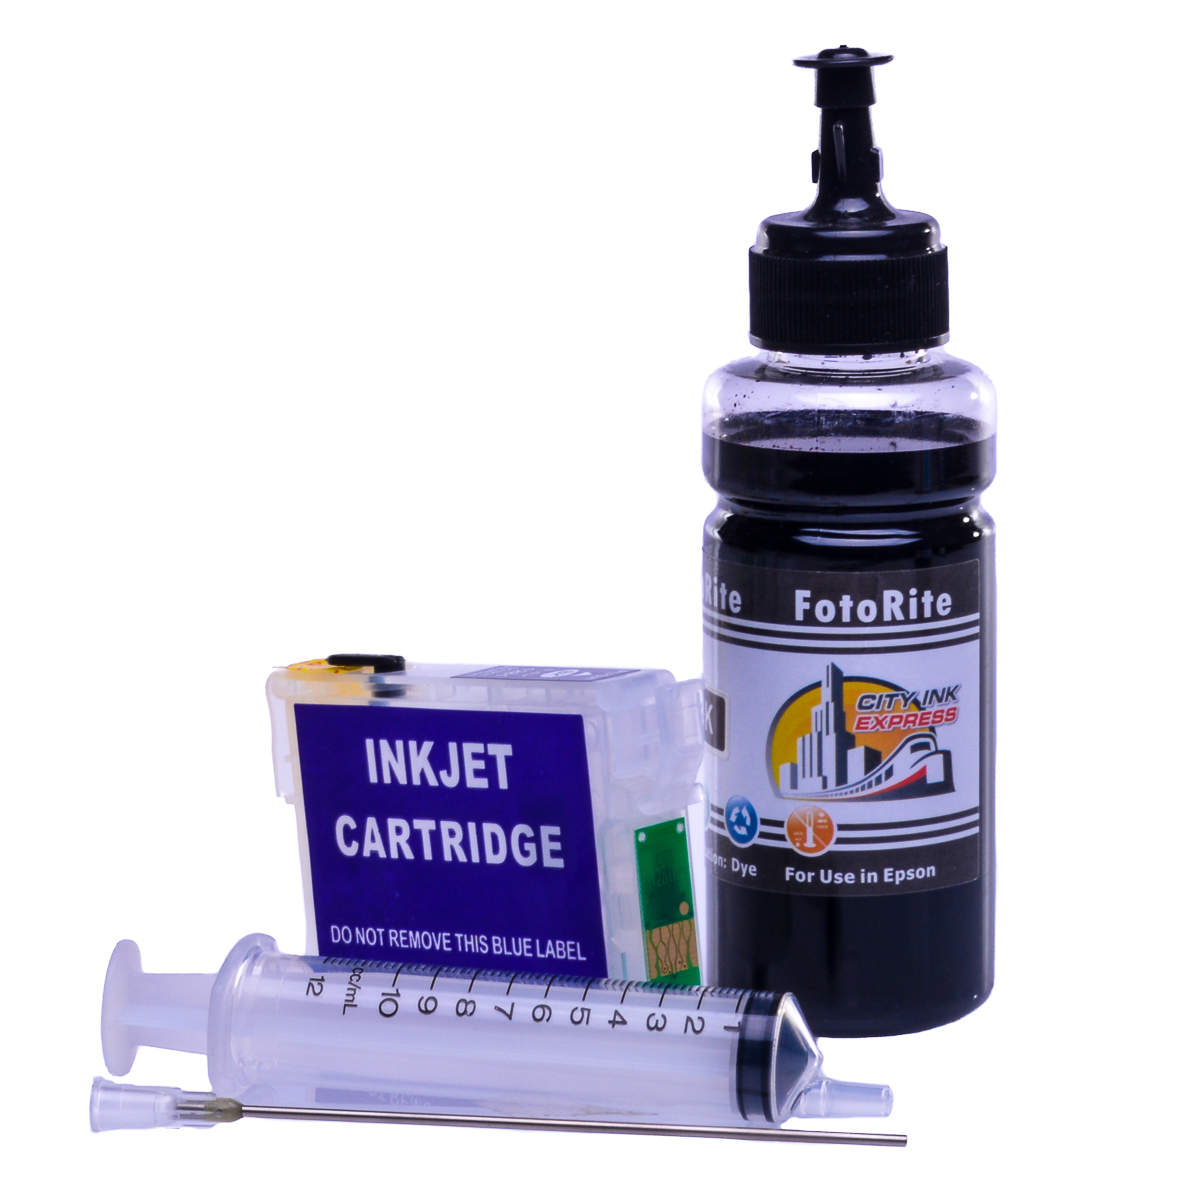 Refillable T0711 Black Cheap printer cartridges for Epson Stylus D120 C13T07114010 dye ink